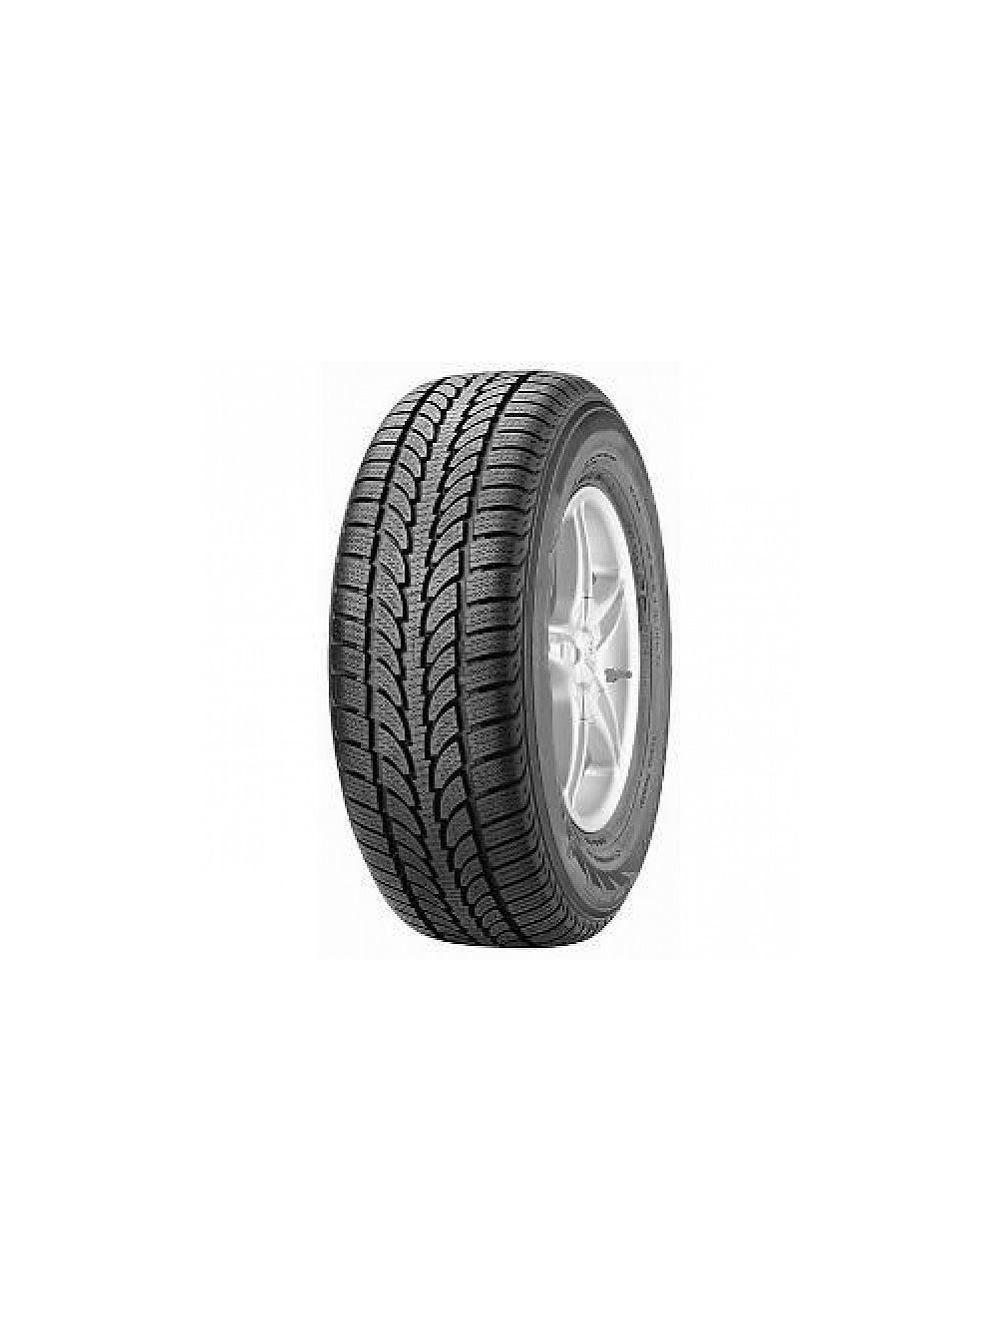 Infinity 175/65R14 T Ecosnow Téli gumi